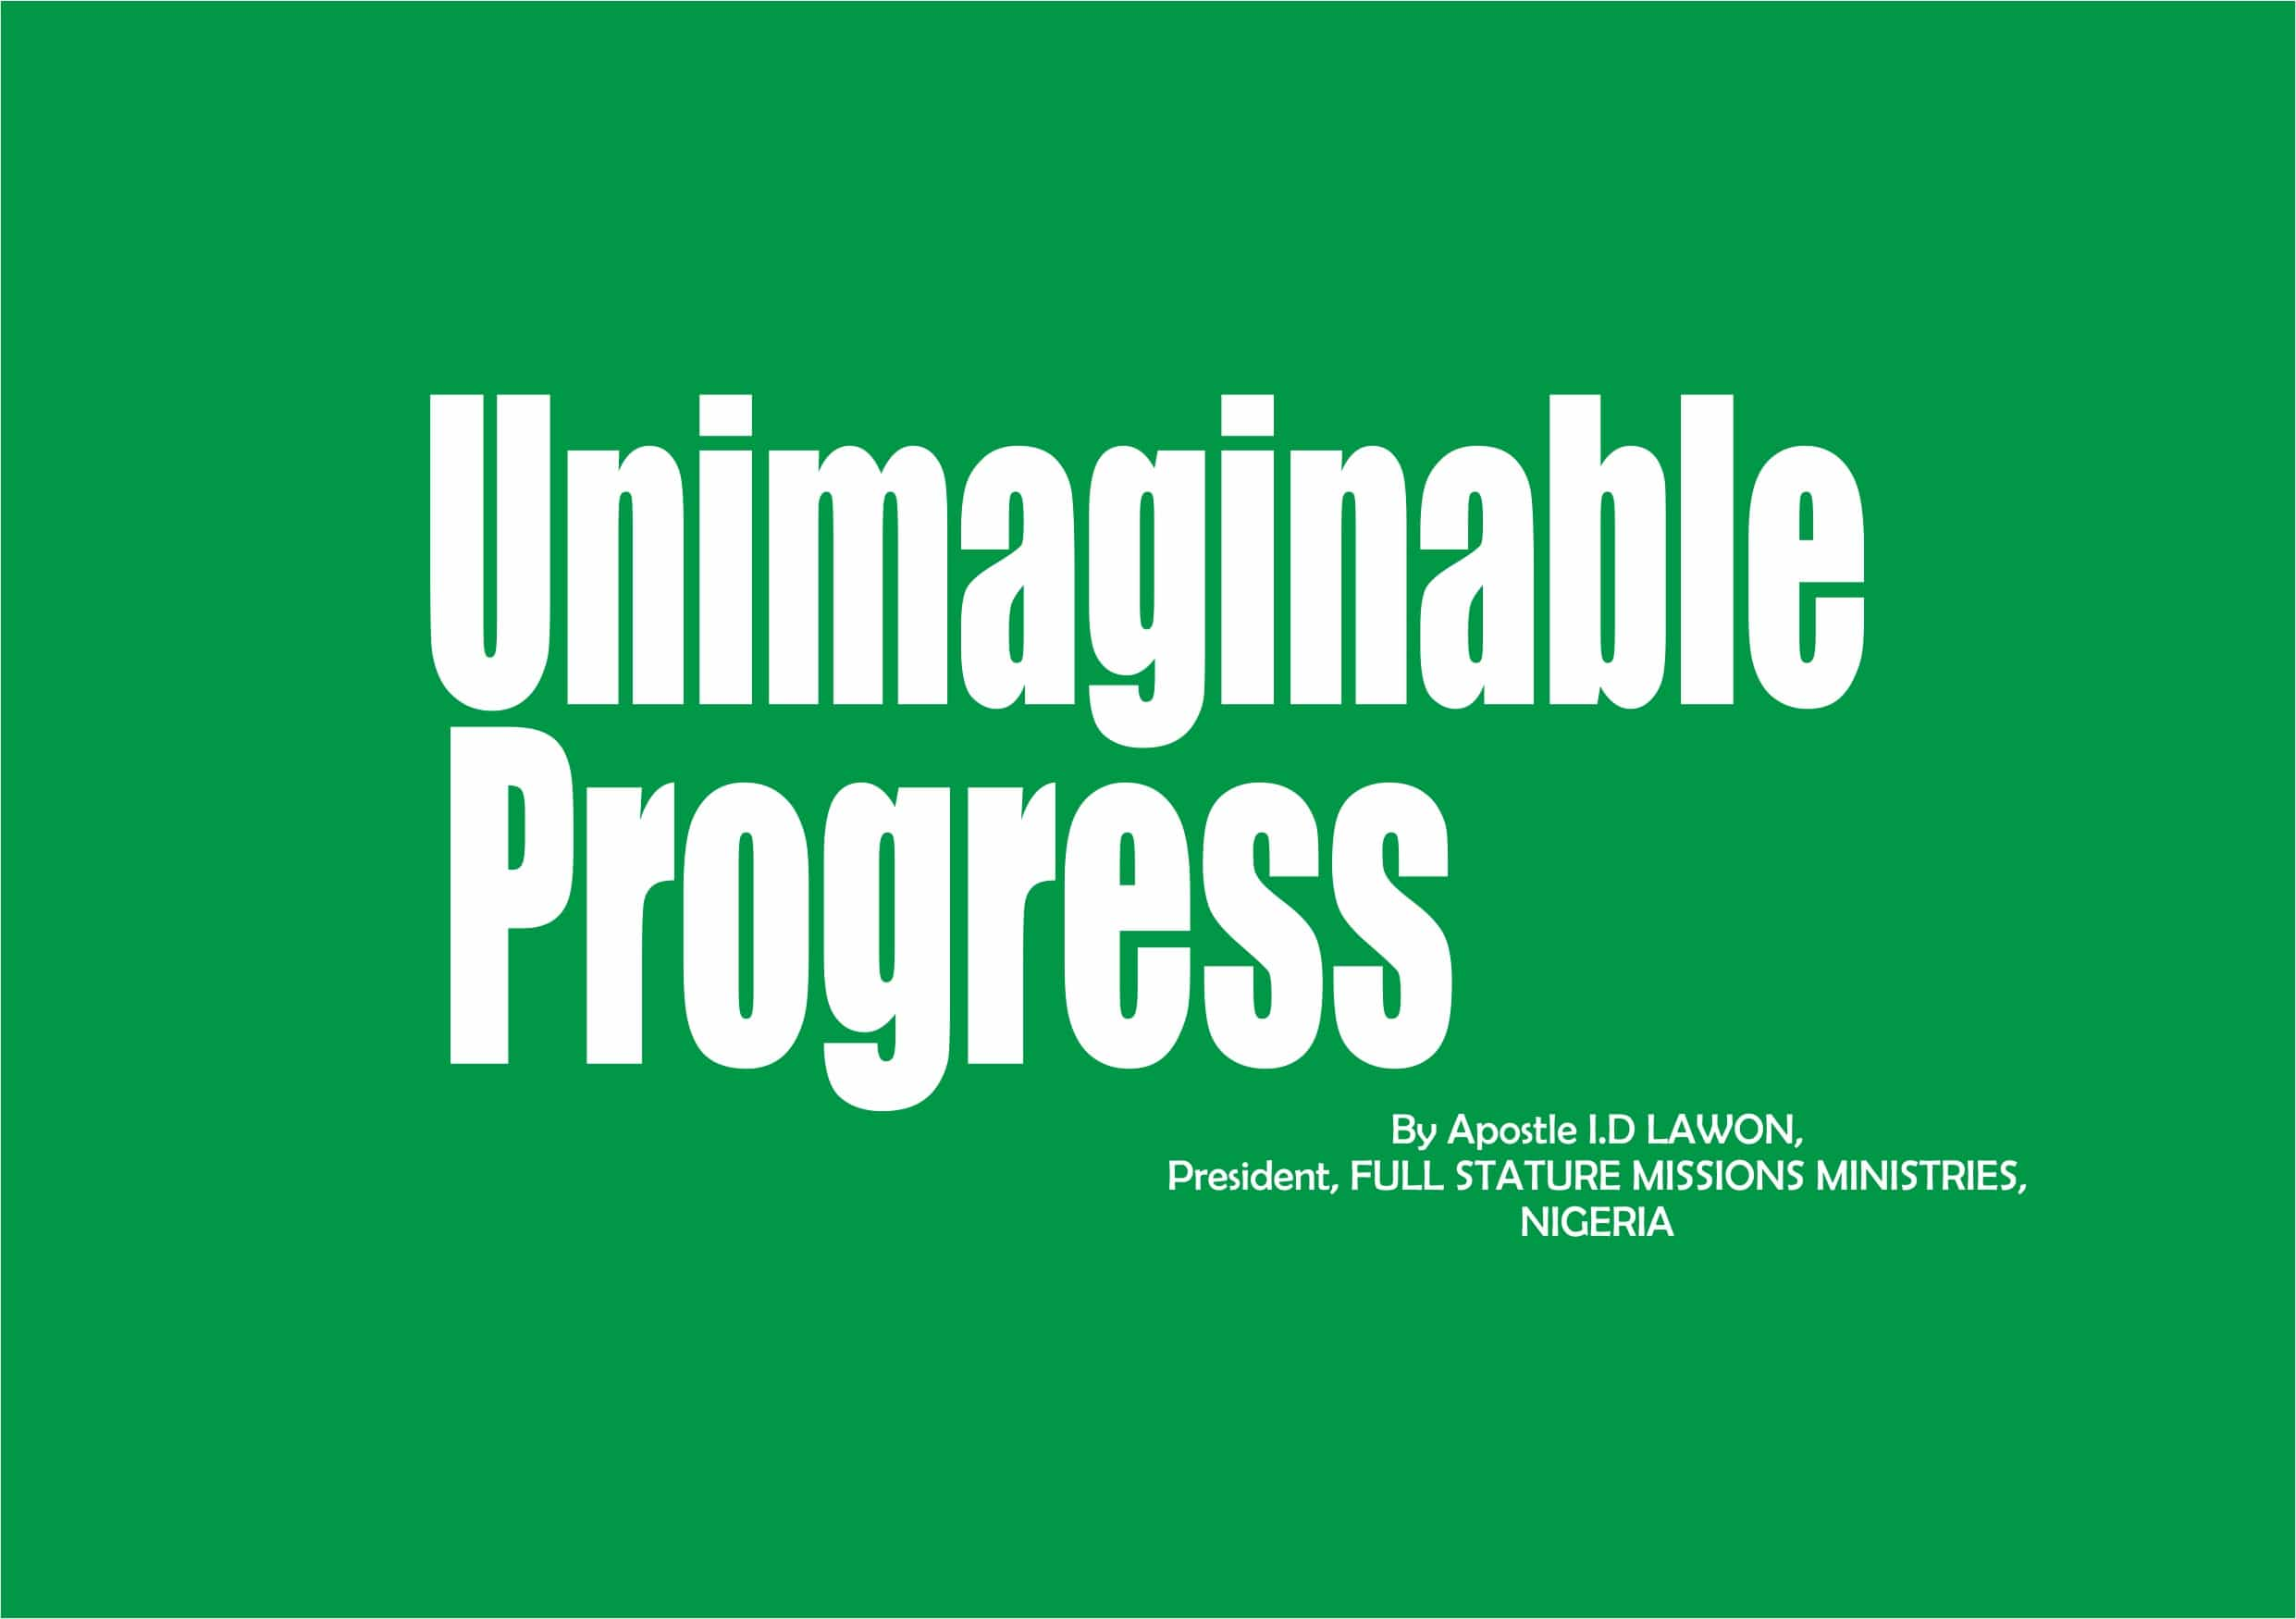 Unimaginable Progress, by Apostle I.D Lawon